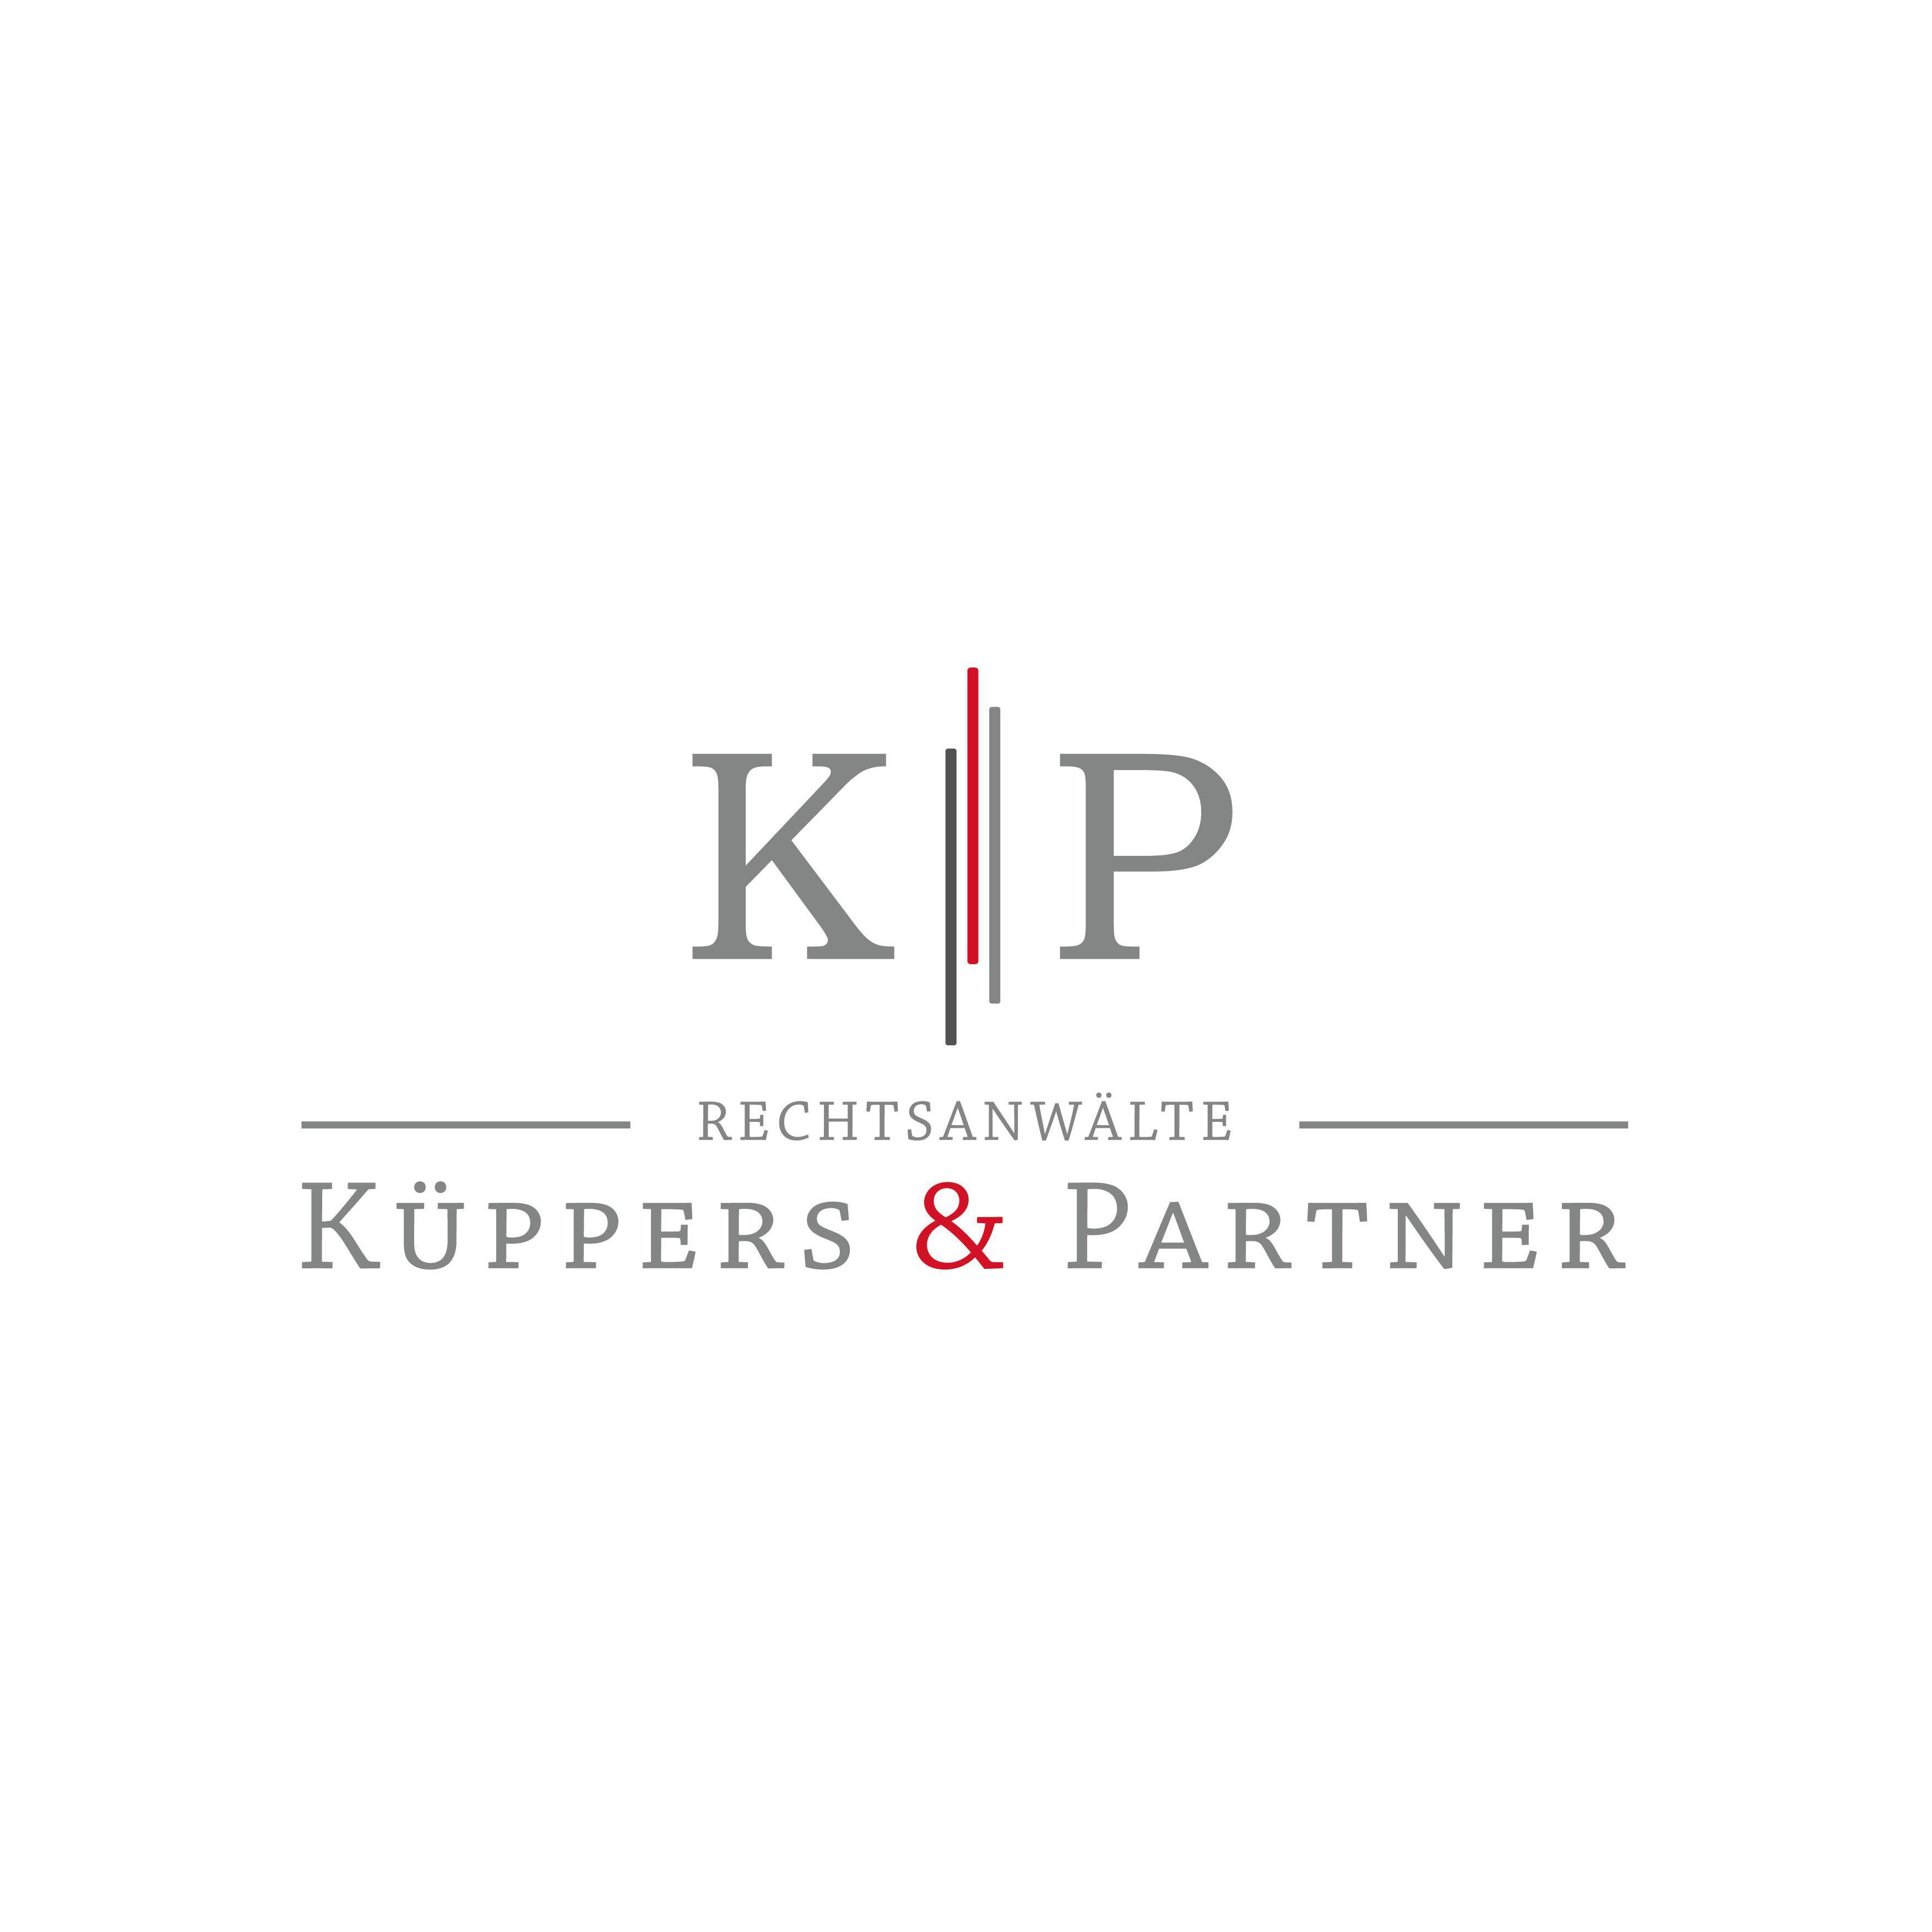 Küppers & Partner